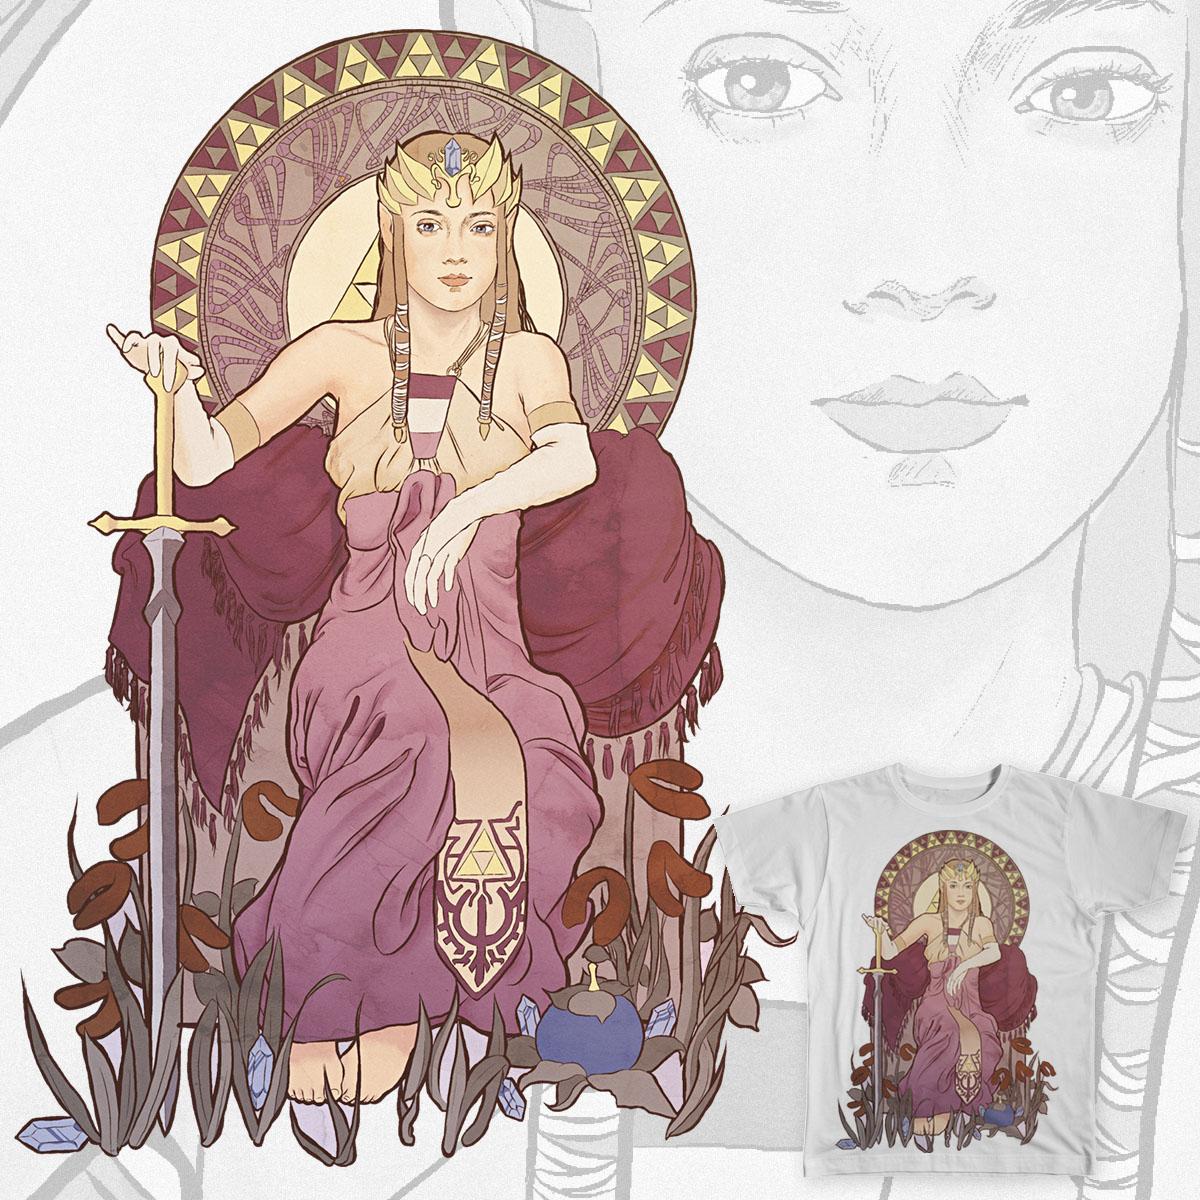 Nouveau Princess by sunnless on Threadless